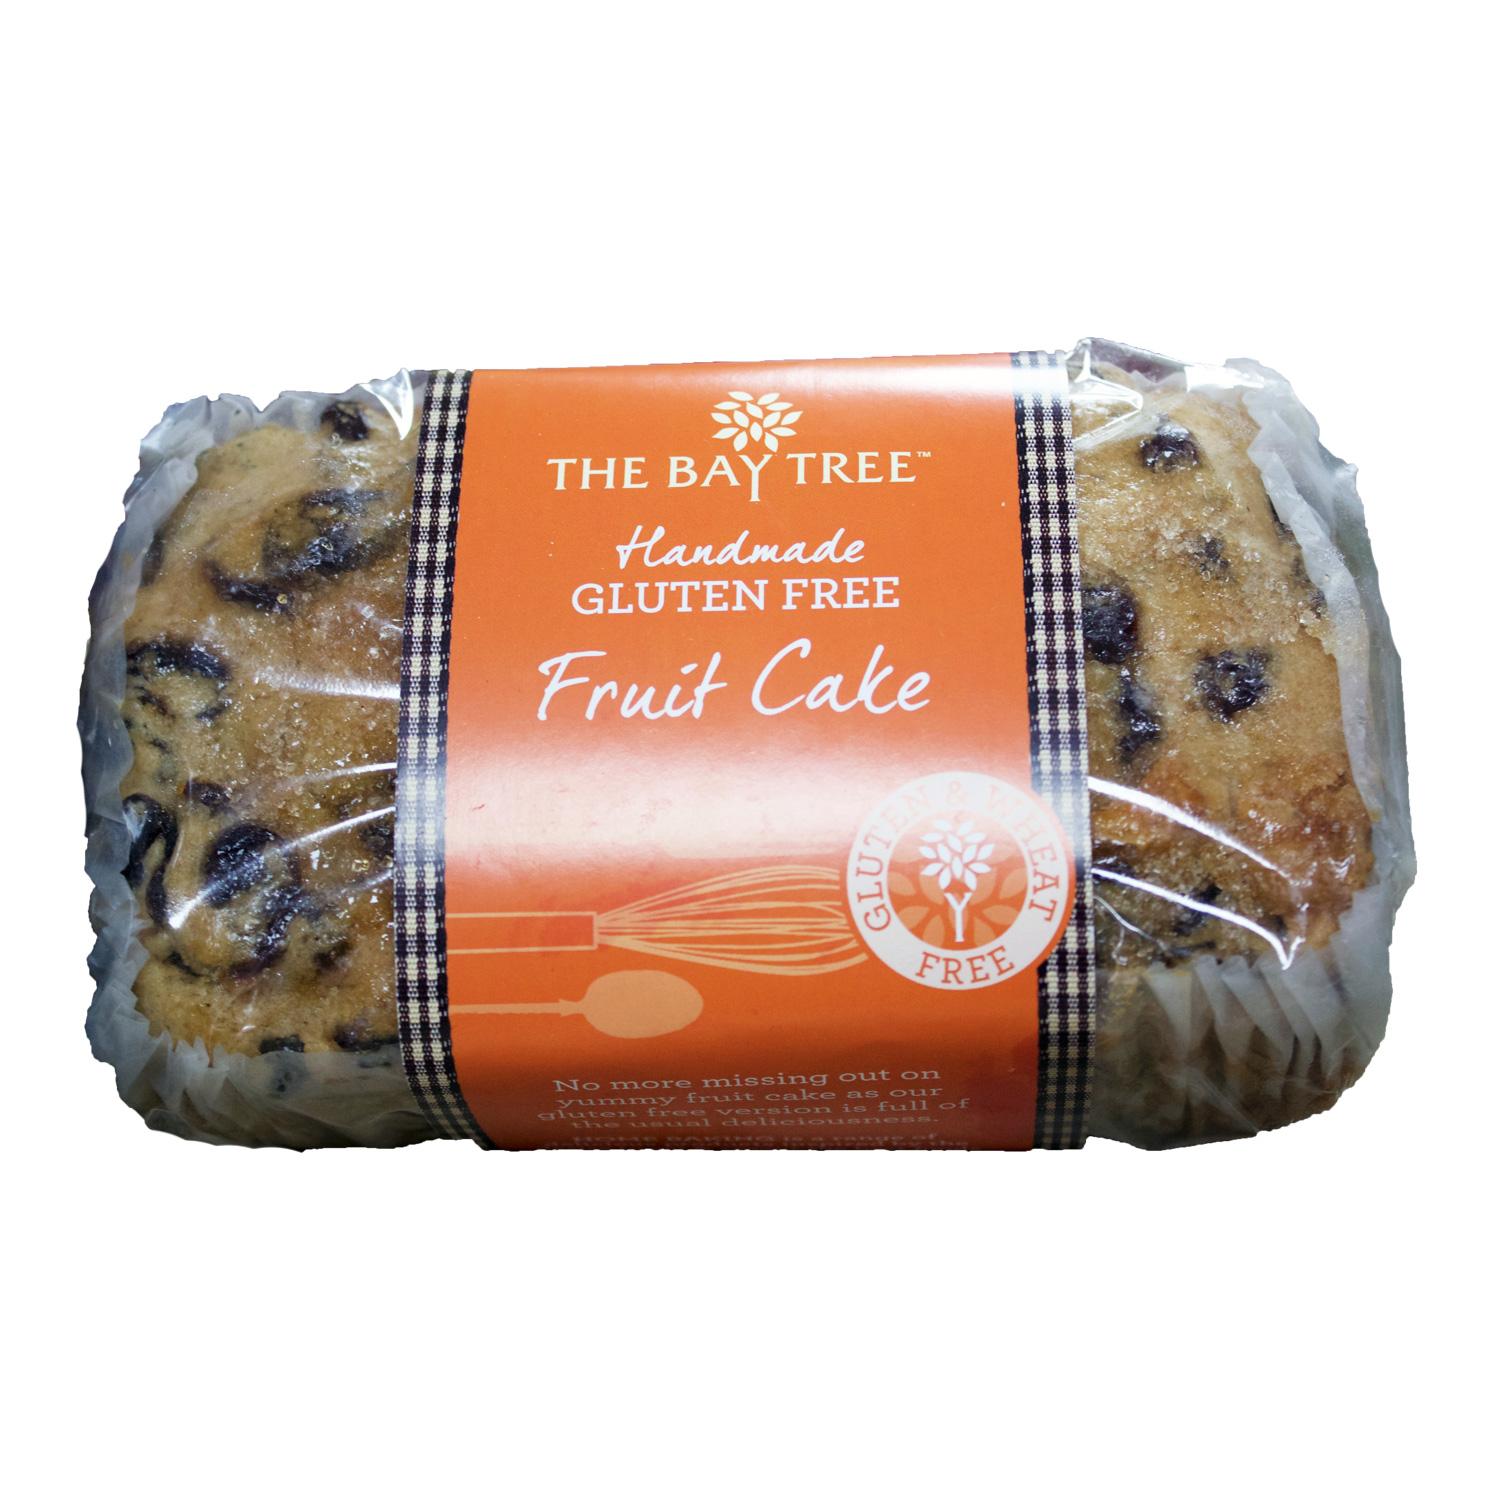 The Bay Tree Fruit Cake